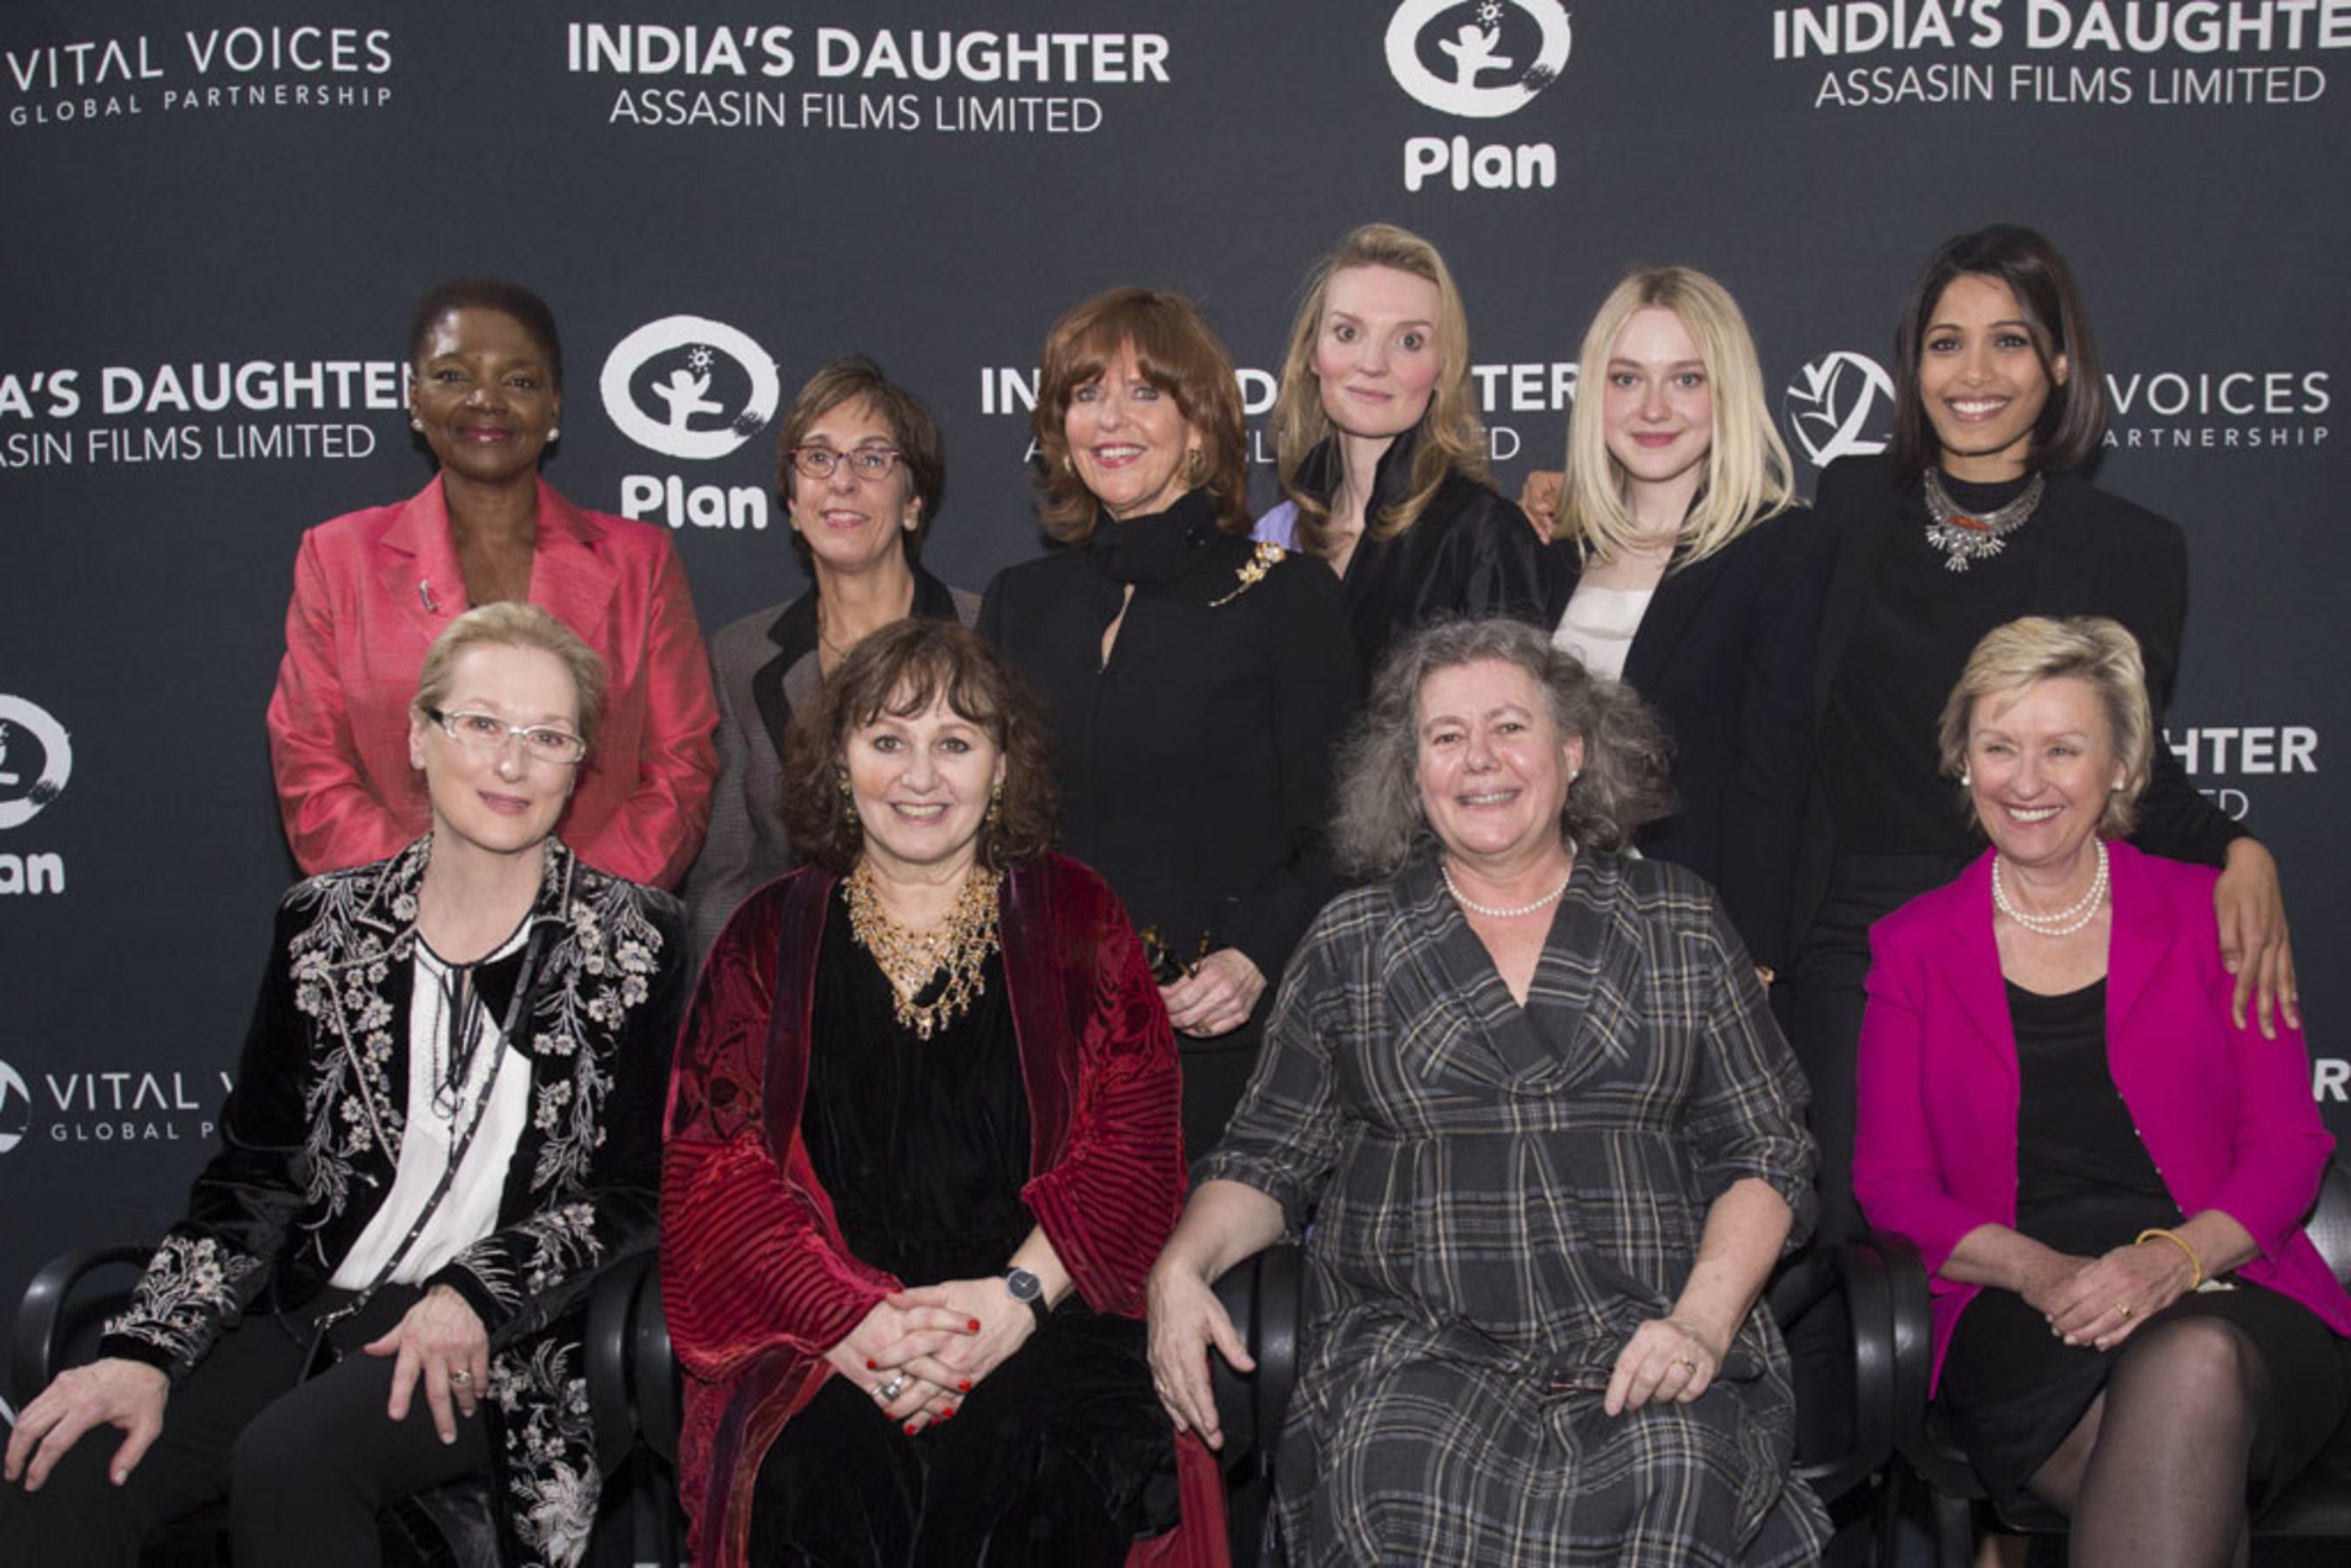 L-R Back: Baroness Valerie Amos, Tessie San Martin, Susan Davis, Alyse Nelson, Dakota Fanning, Freida Pinto; L-R Front: Meryl Streep, Leslee Udwin, Tanya Barron, Tina Brown